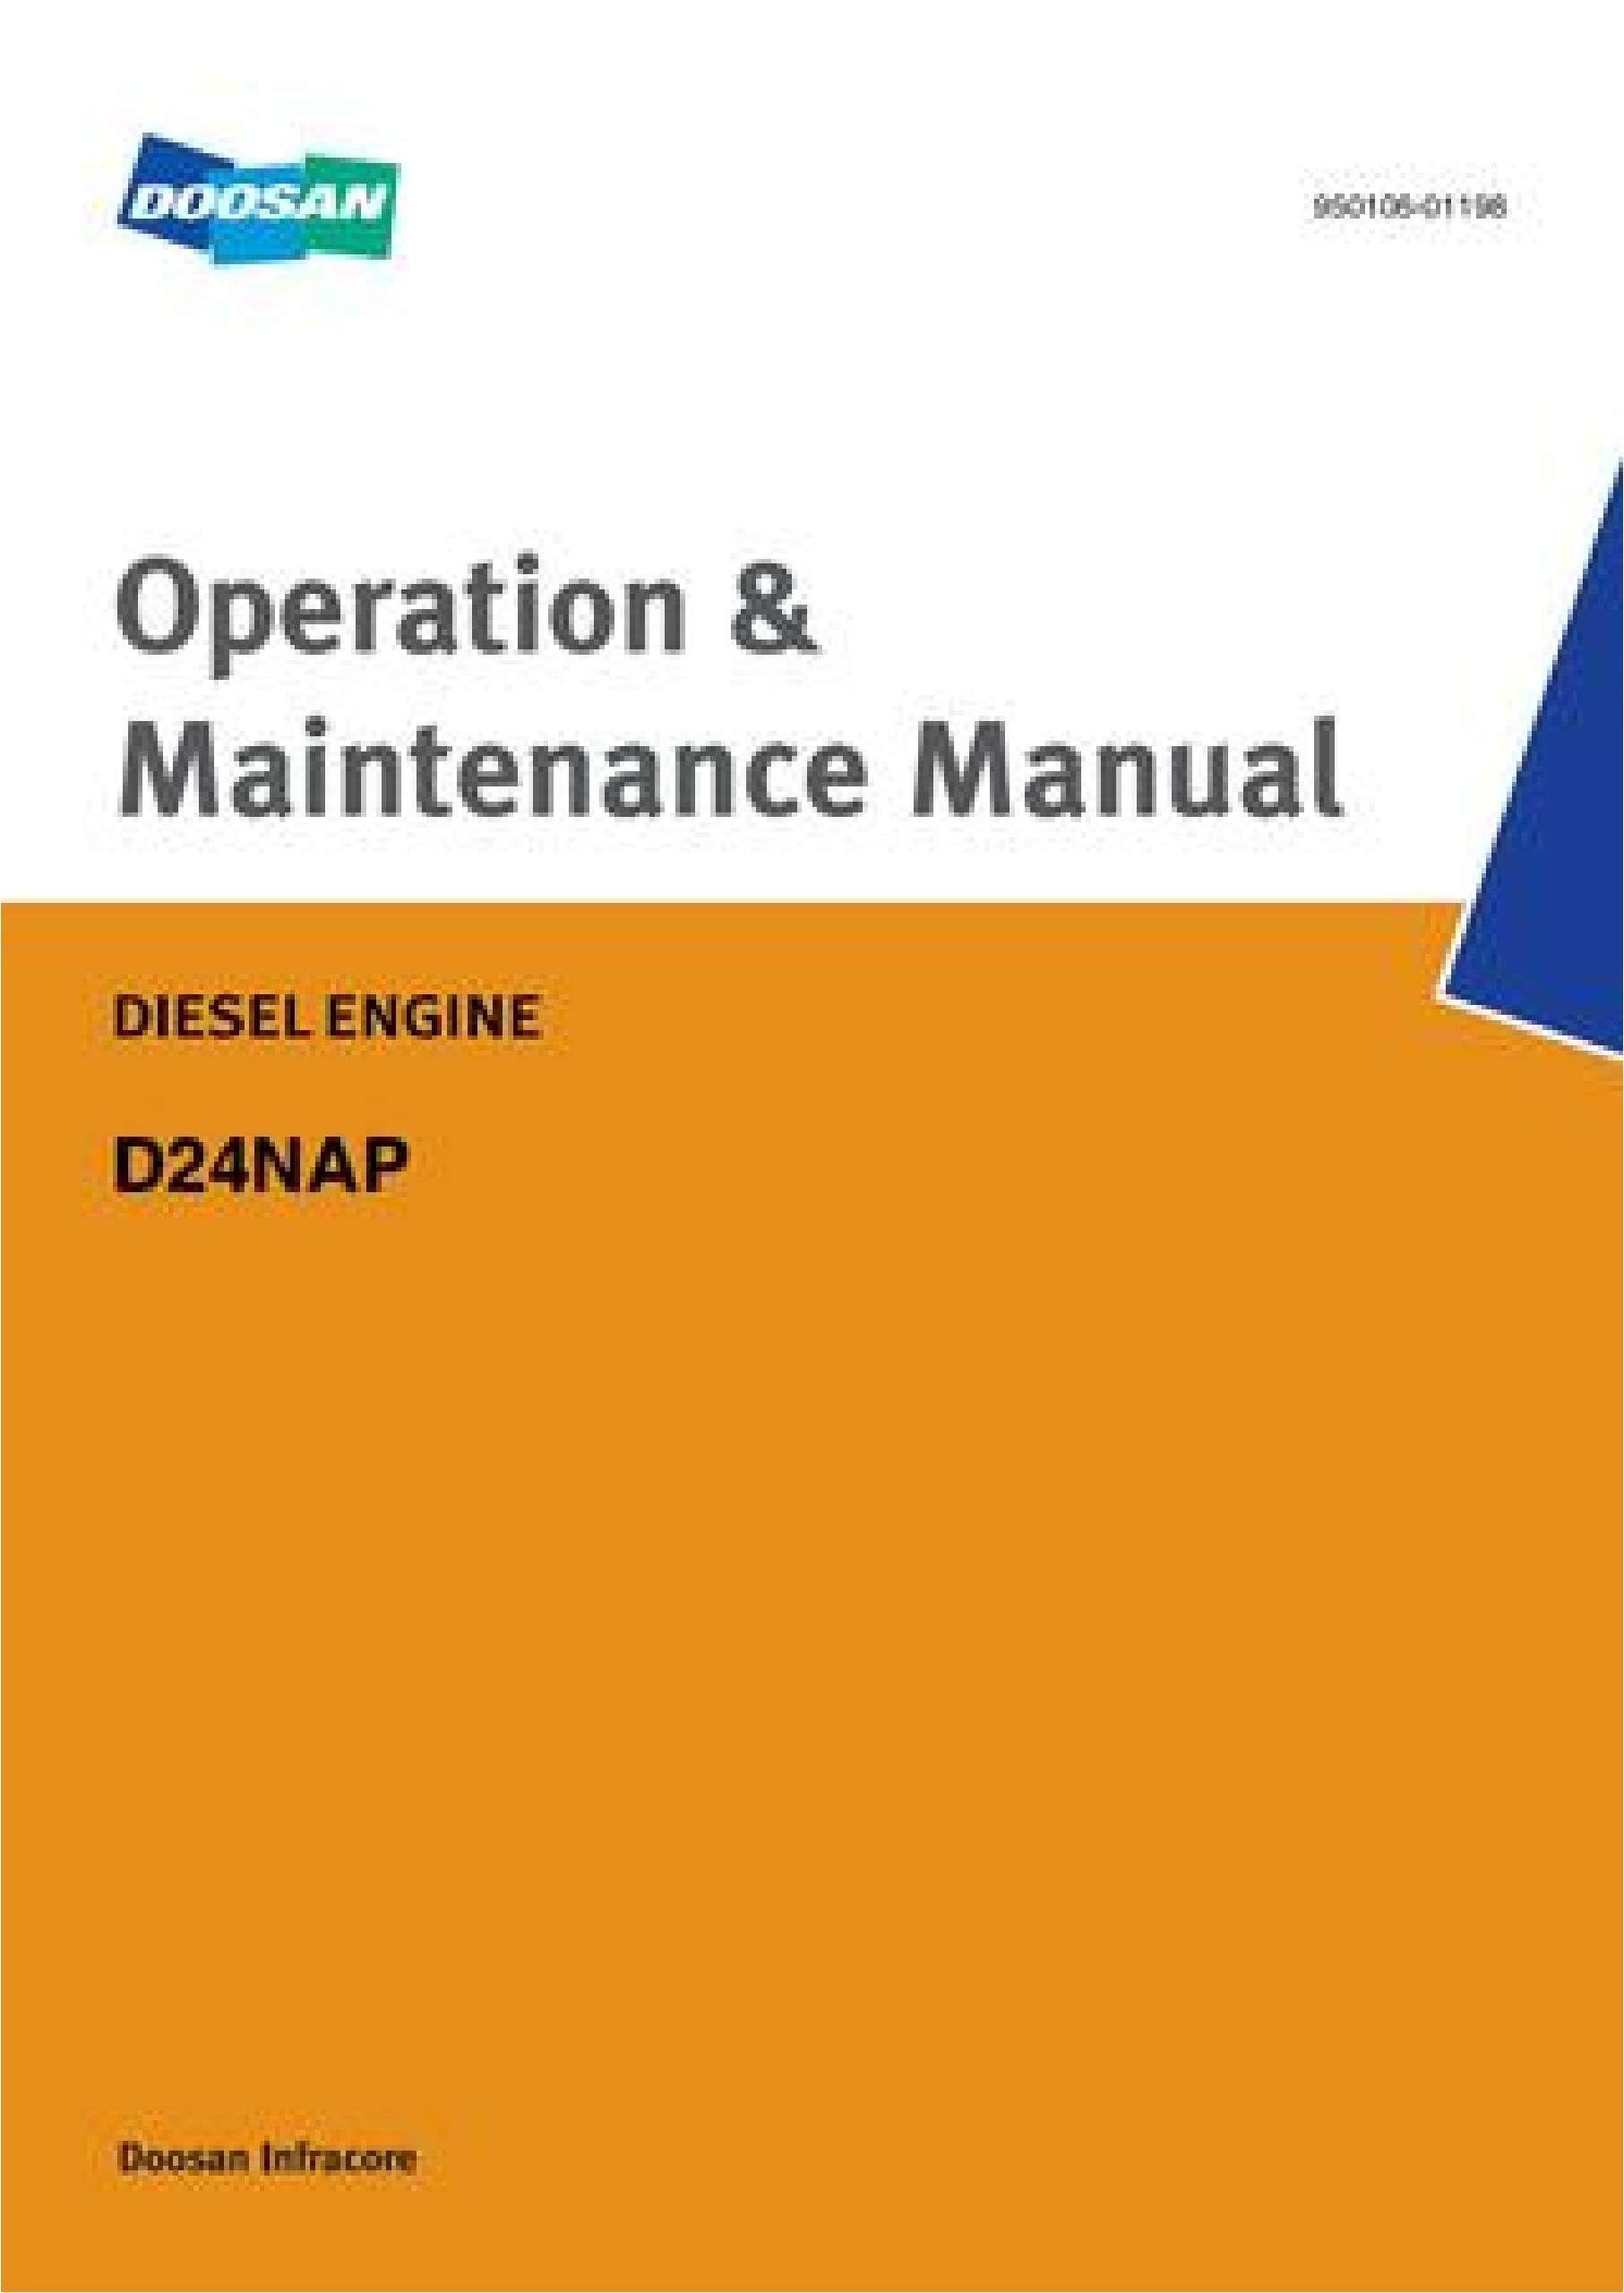 Doosan Diesel Engines Service, Maintenance manual SS-01